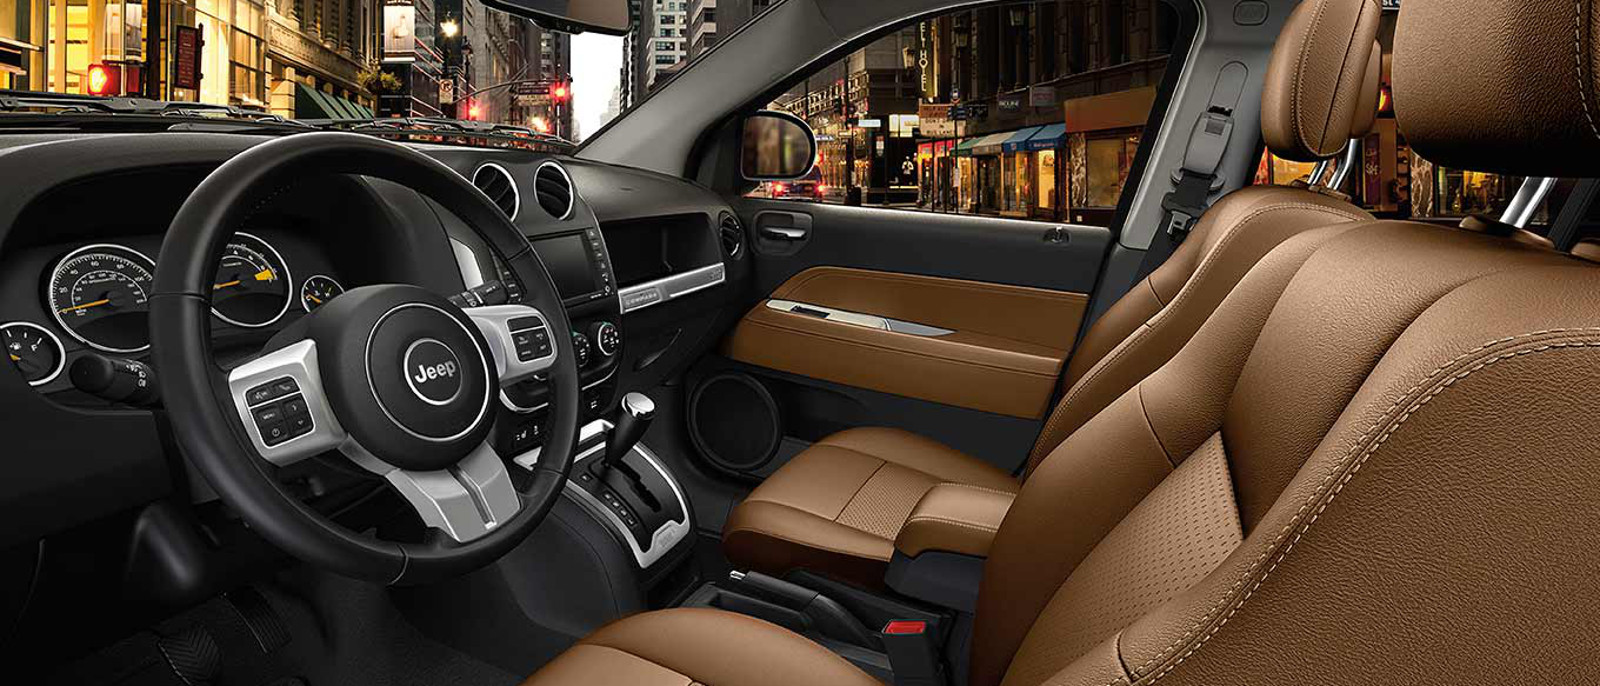 2014 jeep Compass Interior